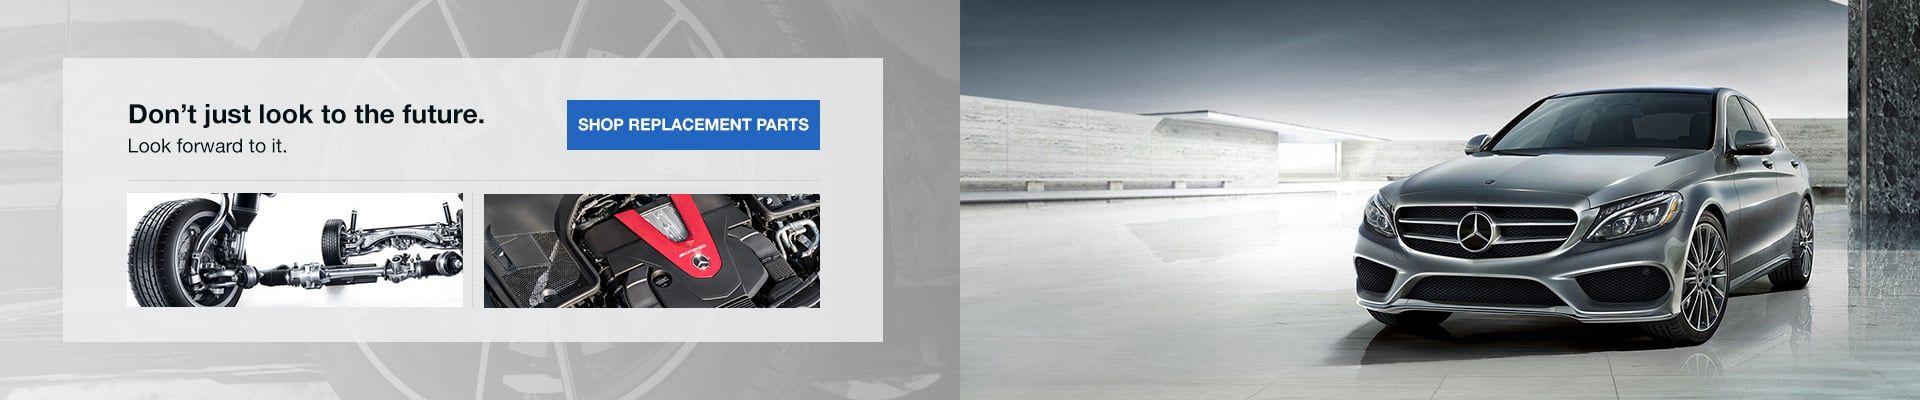 Mercedes-Benz Replacement Parts